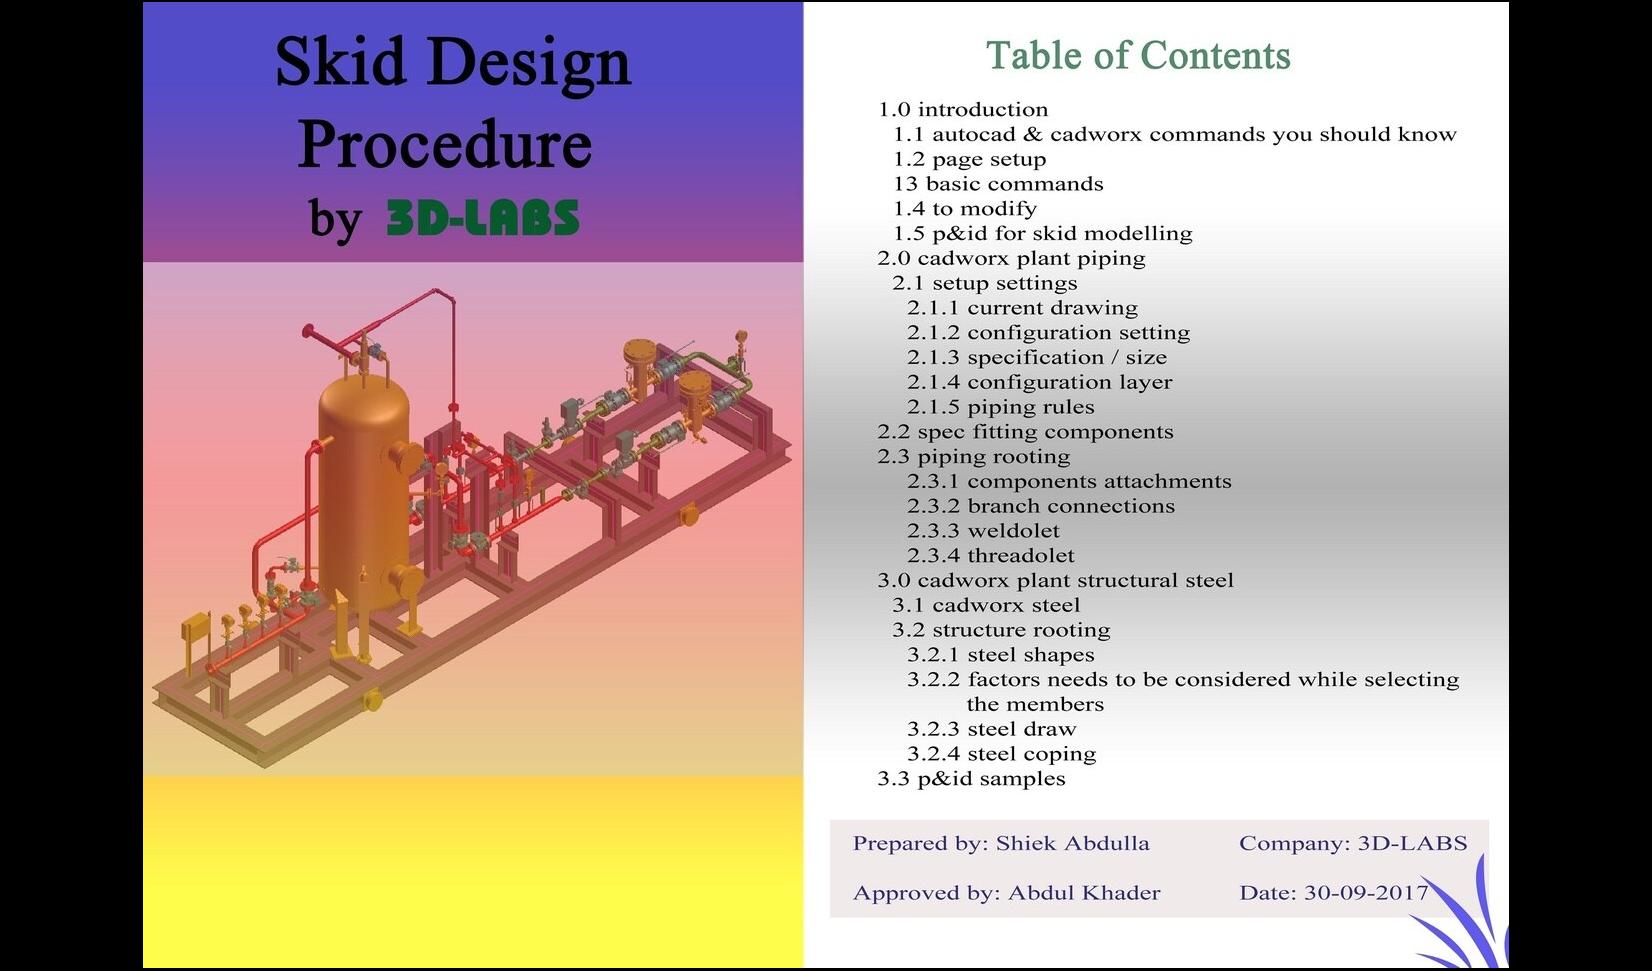 Skid Basic Design Procedure